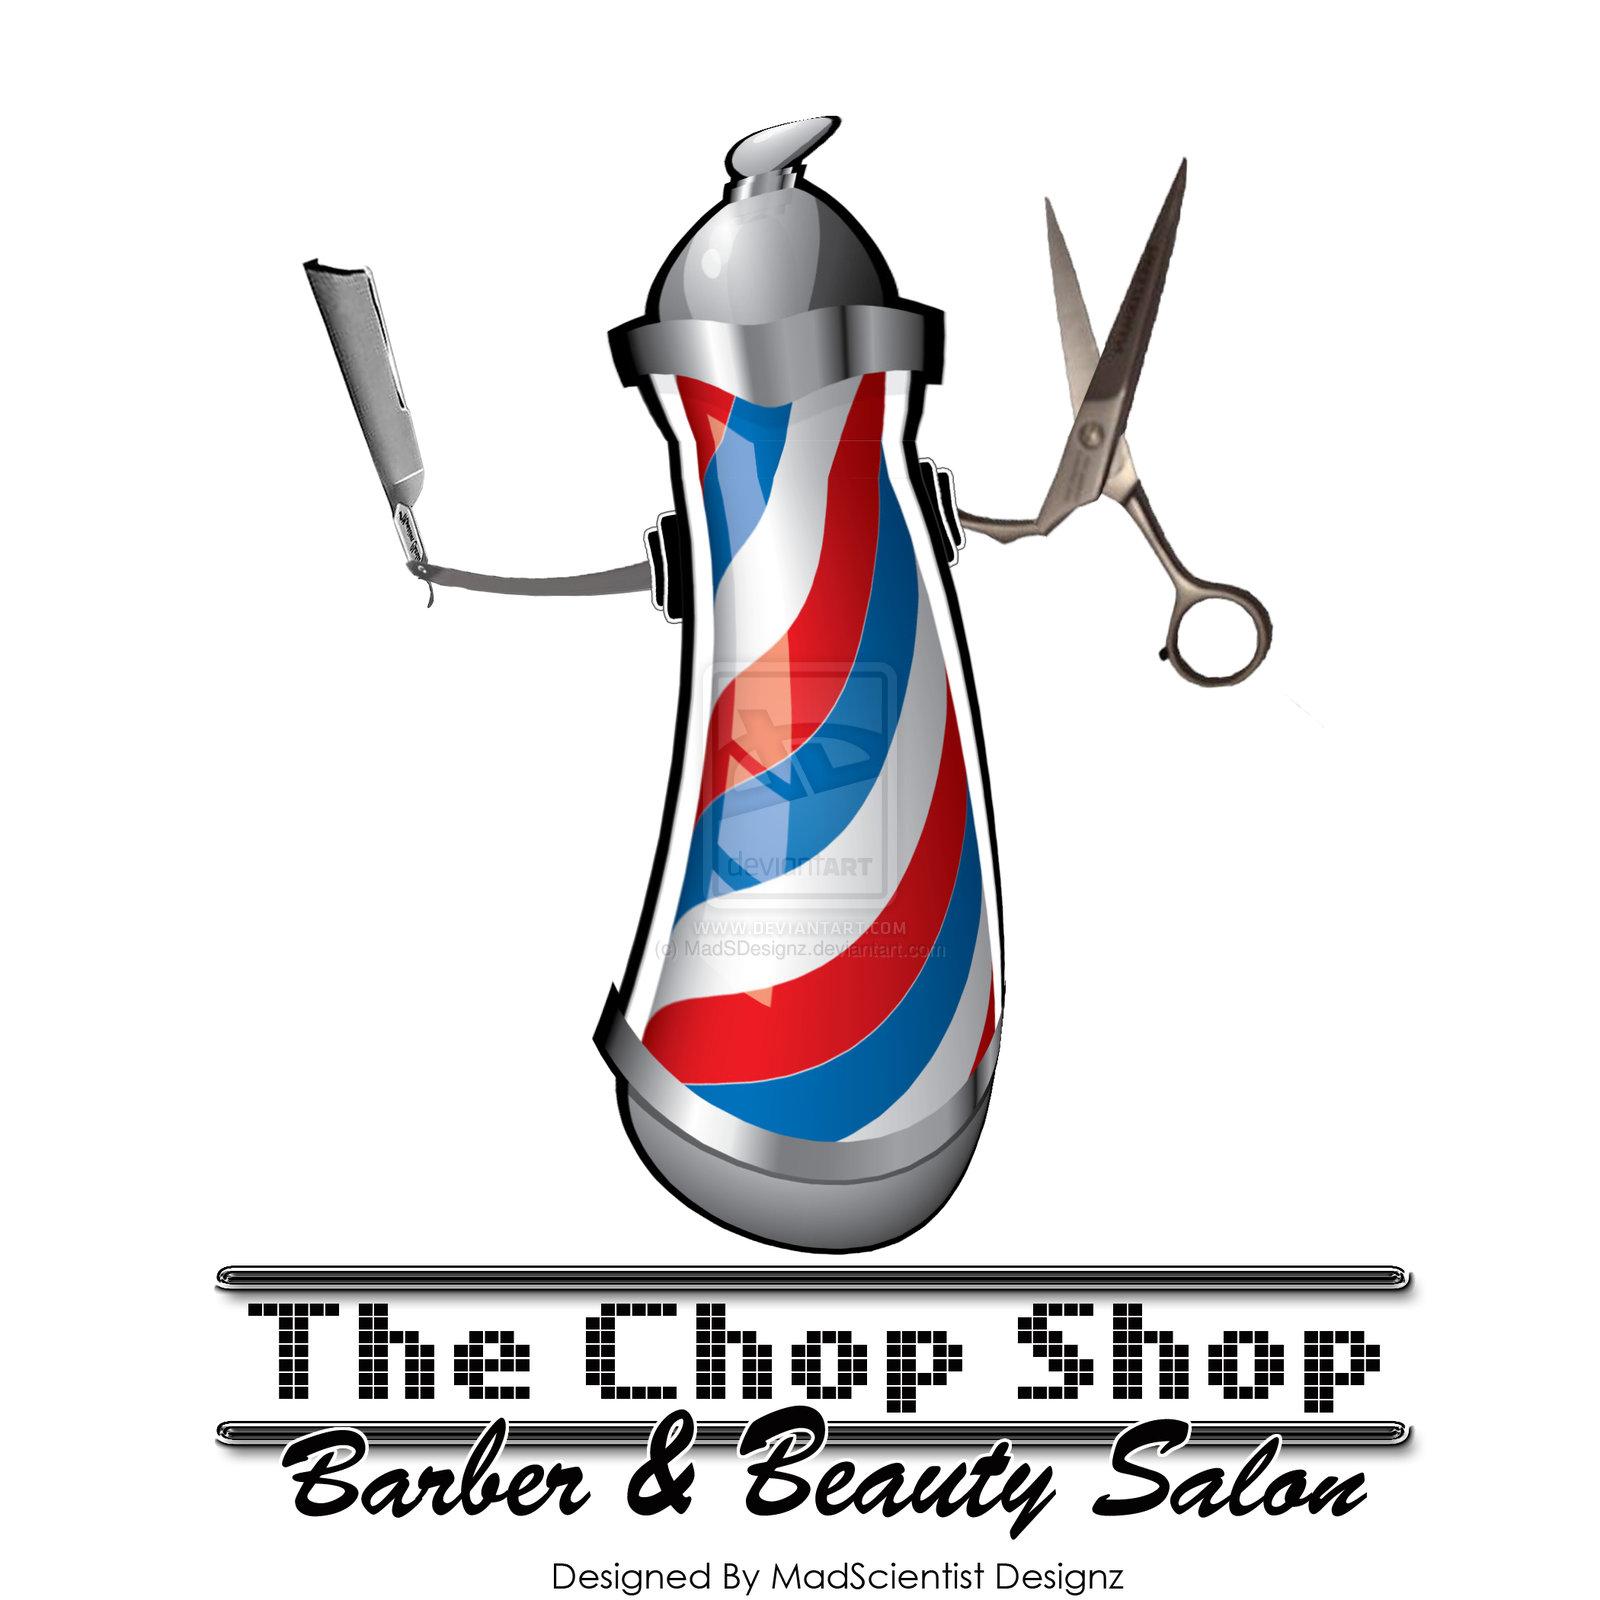 barber logo design - photo #39